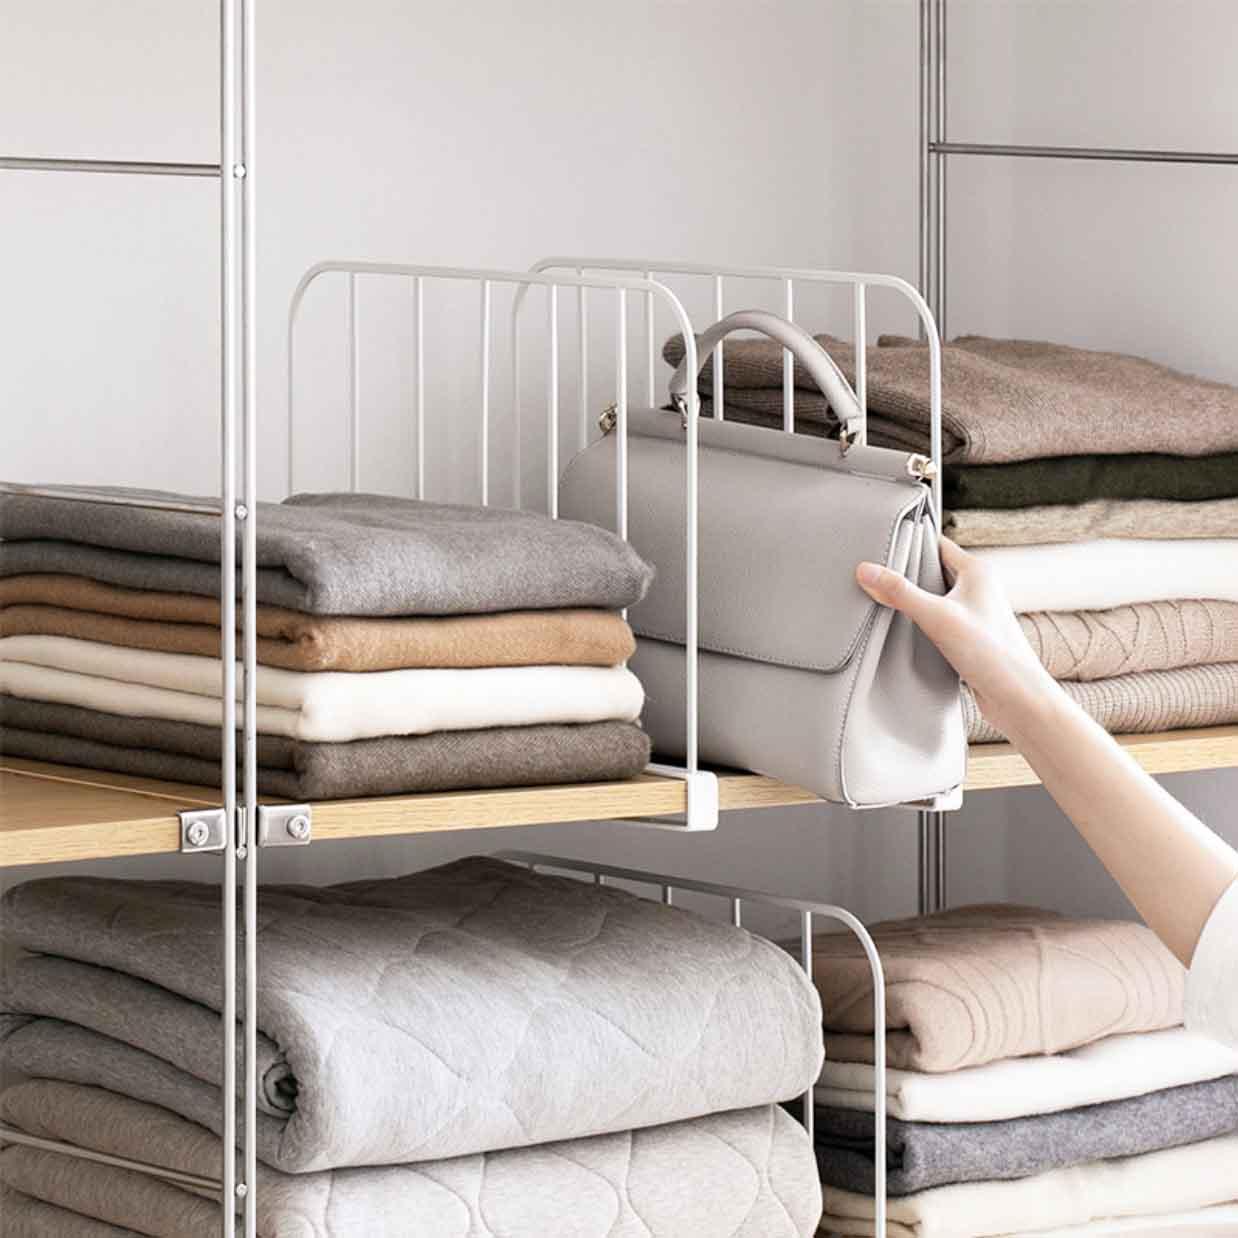 wardrobe shelf divider closet organizer style degree